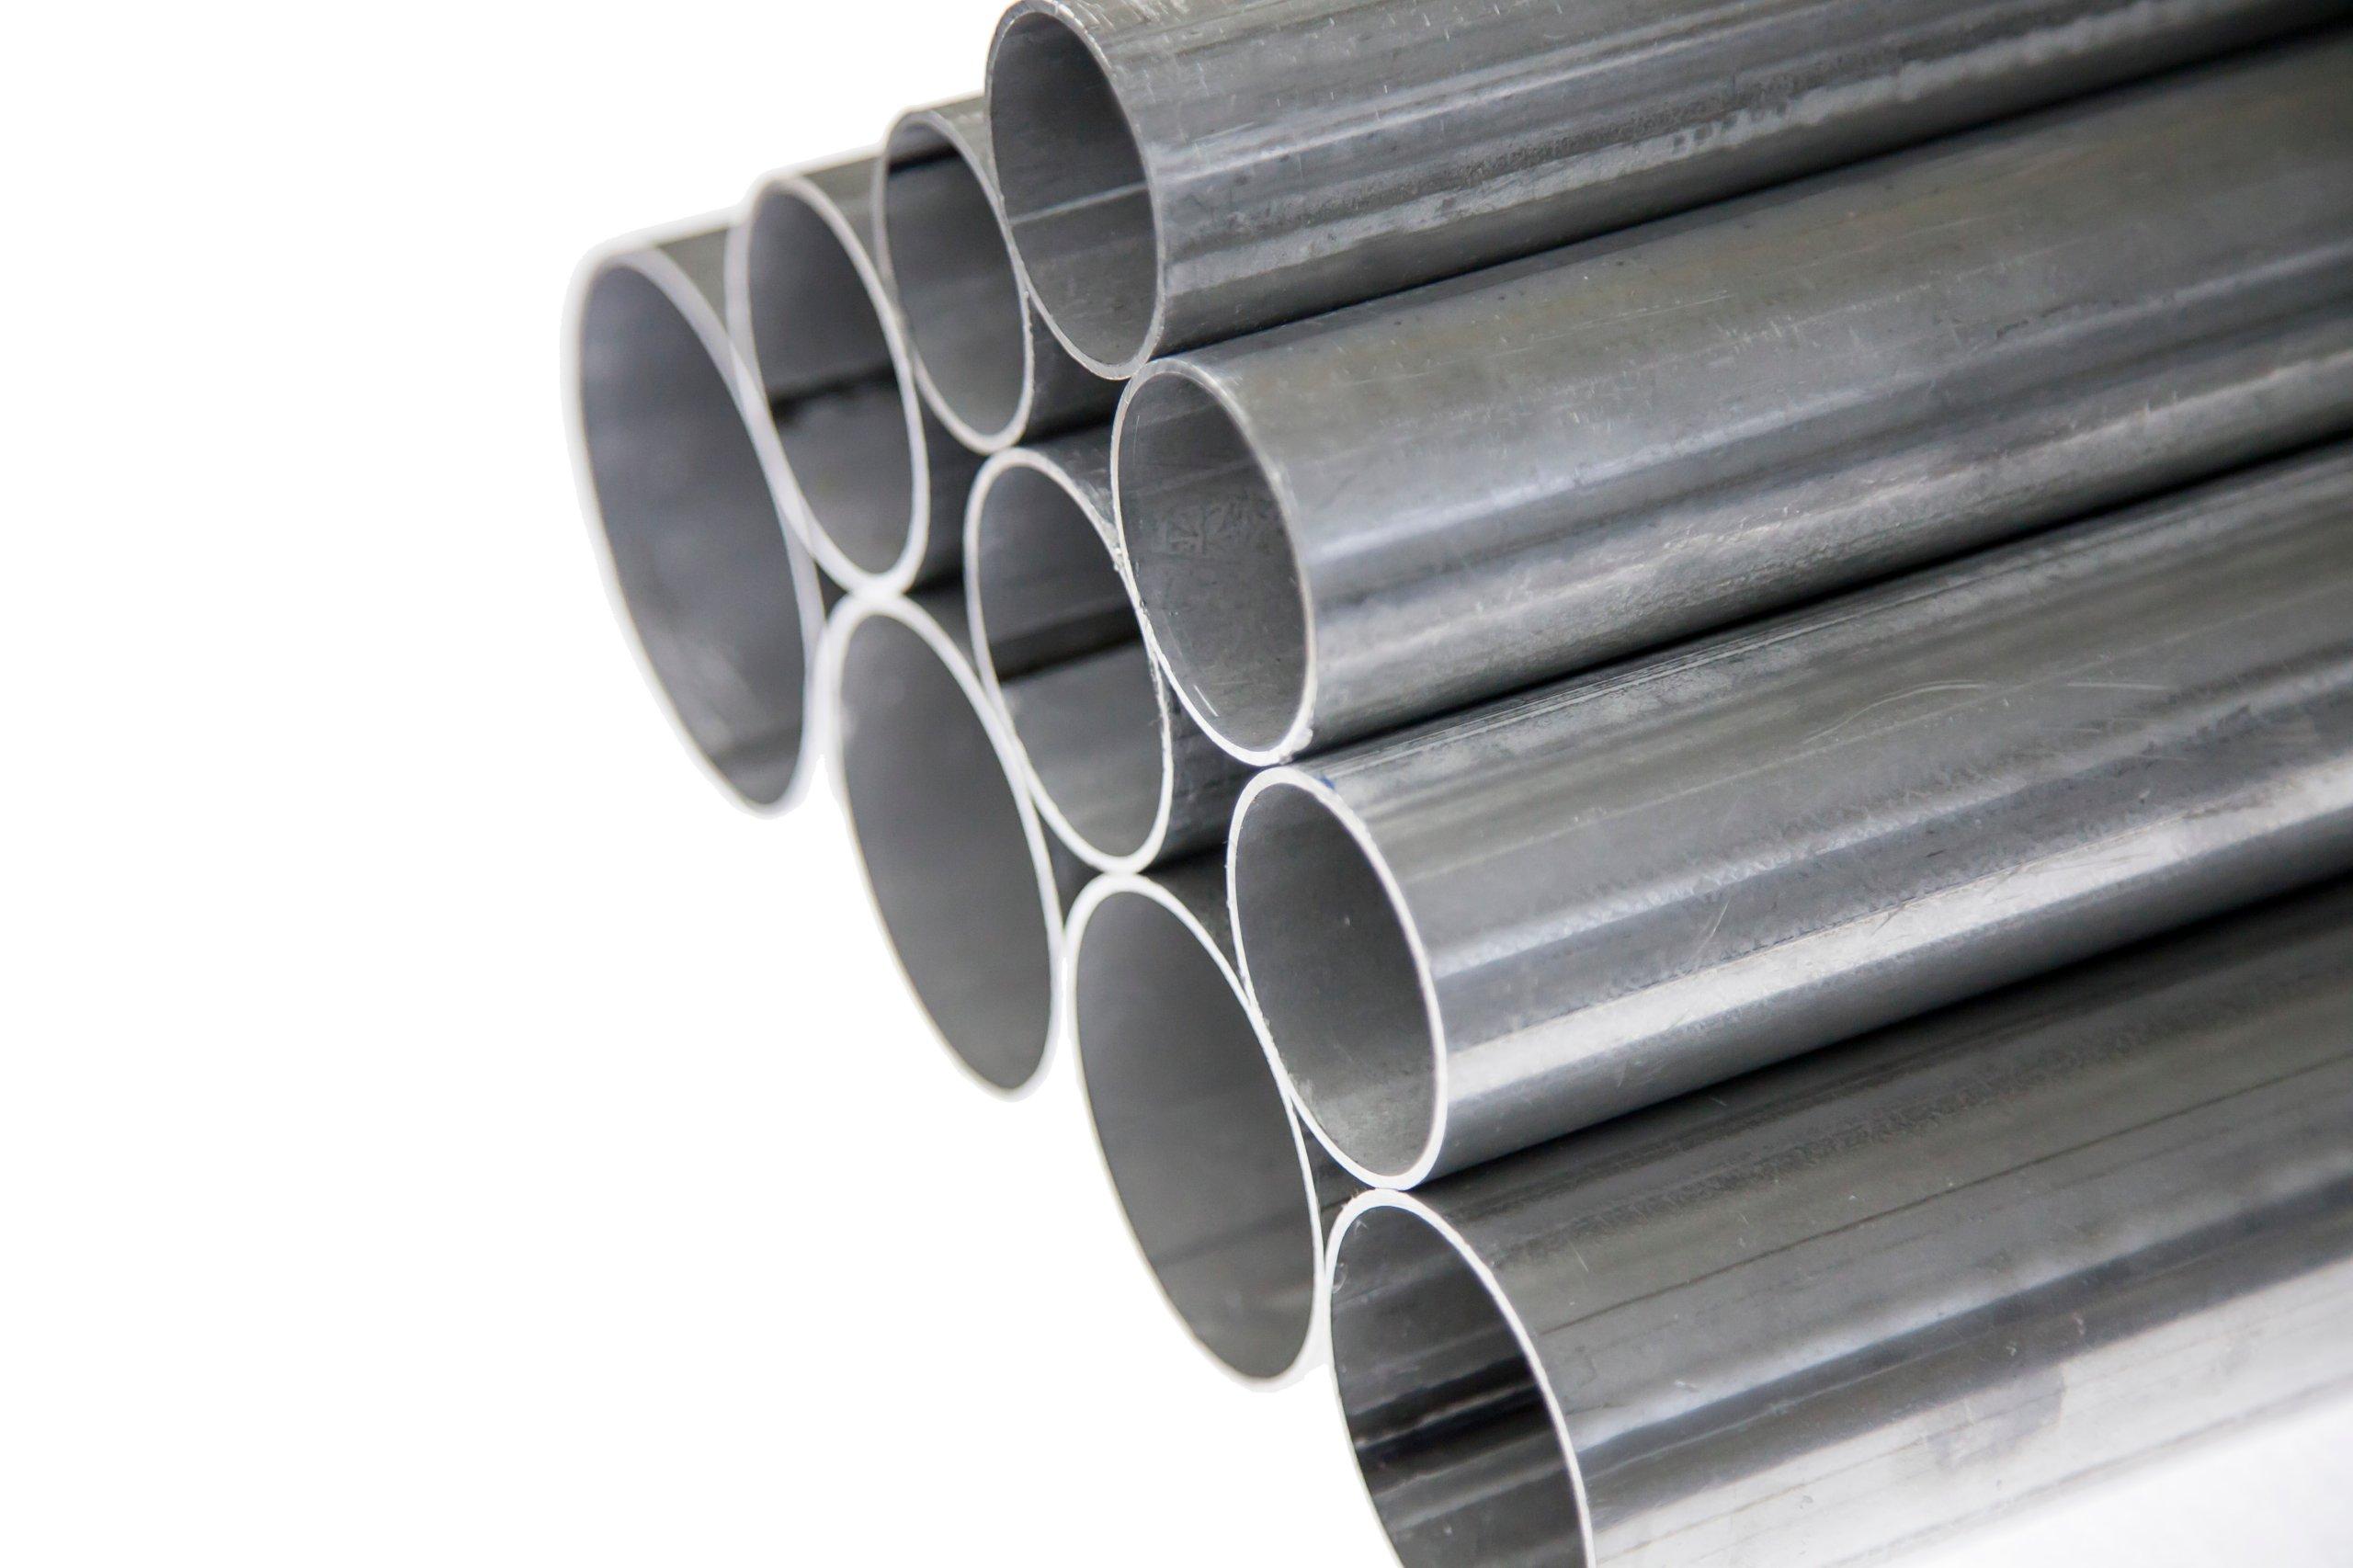 Алюминиевая труба прямой выхлоп 60 мм х 1 погонный метр